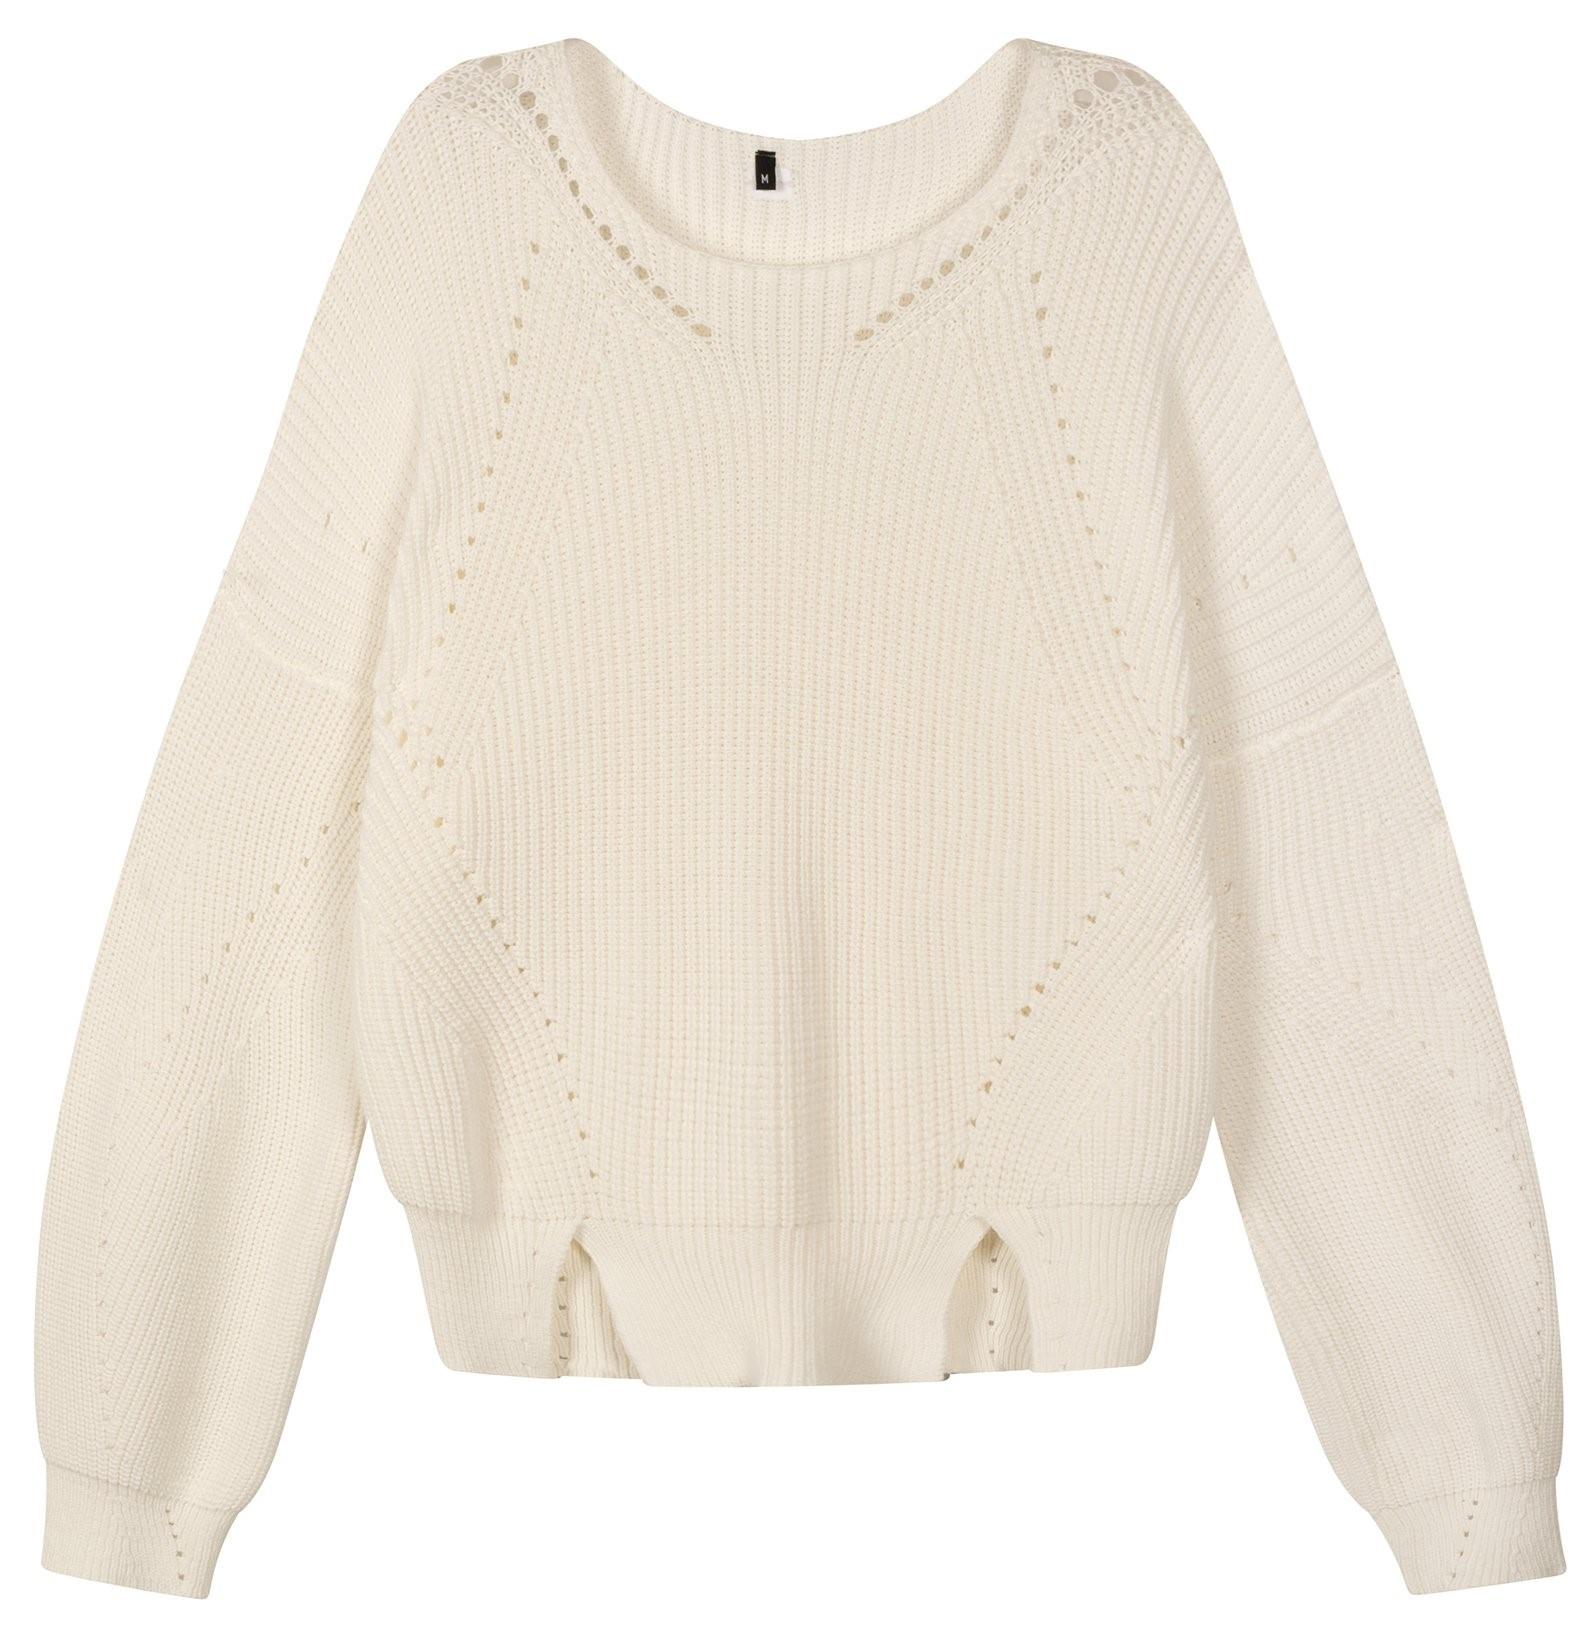 Trui sweater cotton knit white-1